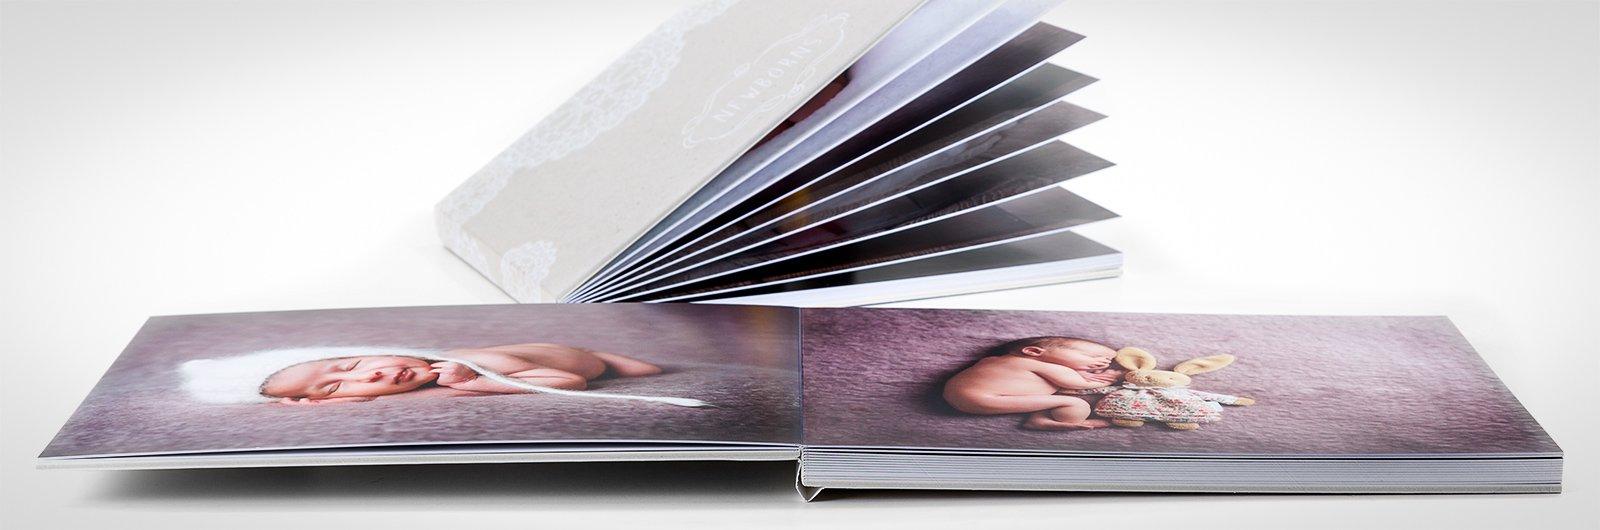 Photo_Book_Bambini_rilegatura_1.jpg.1600x530_q85_crop.jpg